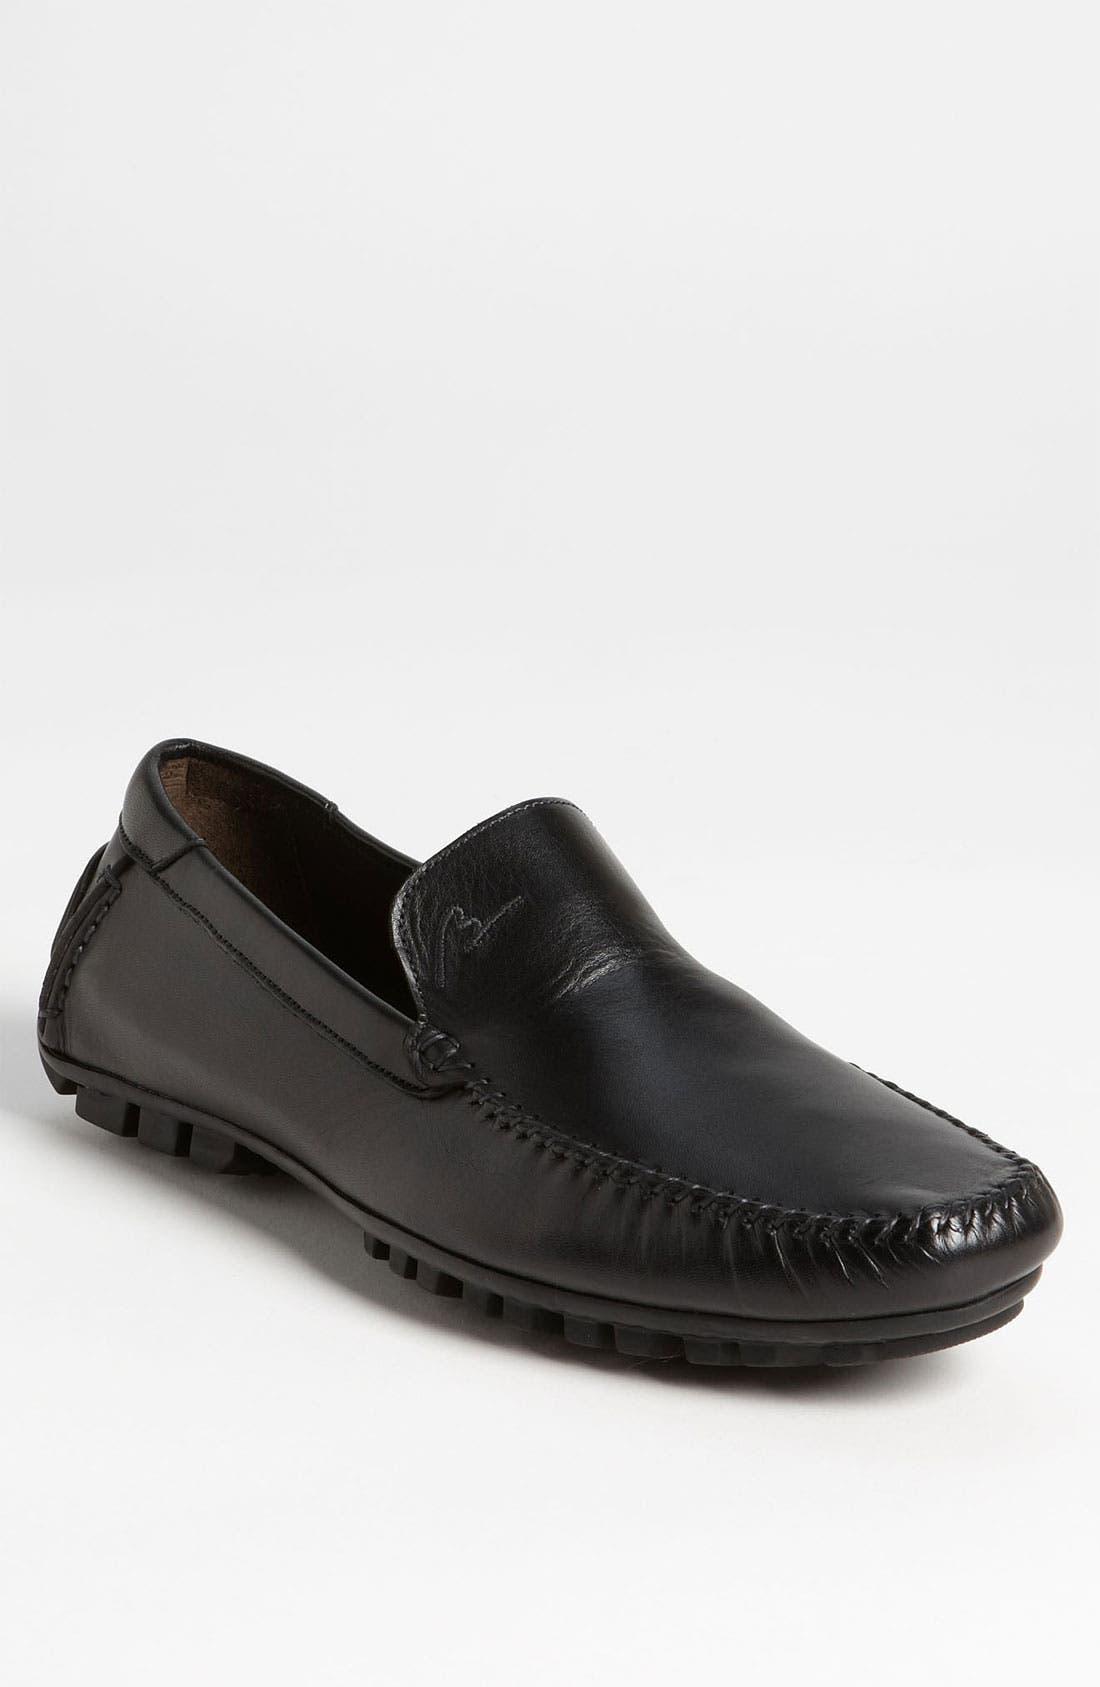 Alternate Image 1 Selected - Bacco Bucci 'Enrico' Driving Shoe (Men)